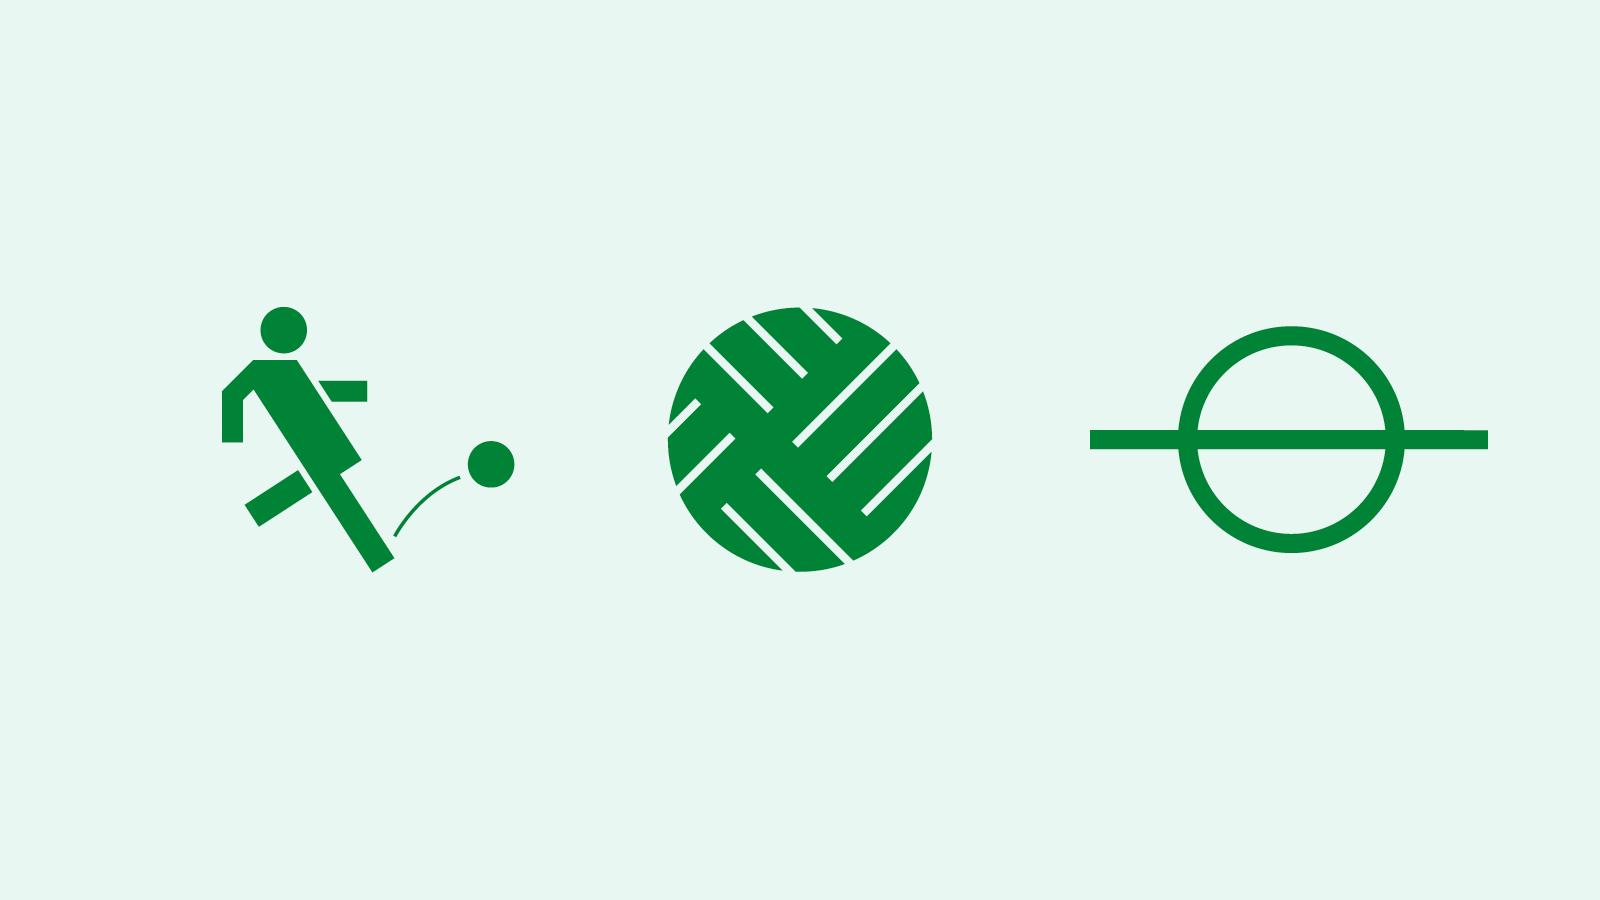 branding-identity-design-sport-football-graphics-dinkit-artwork-prints-posters-gallery-milton-keynes-london-5